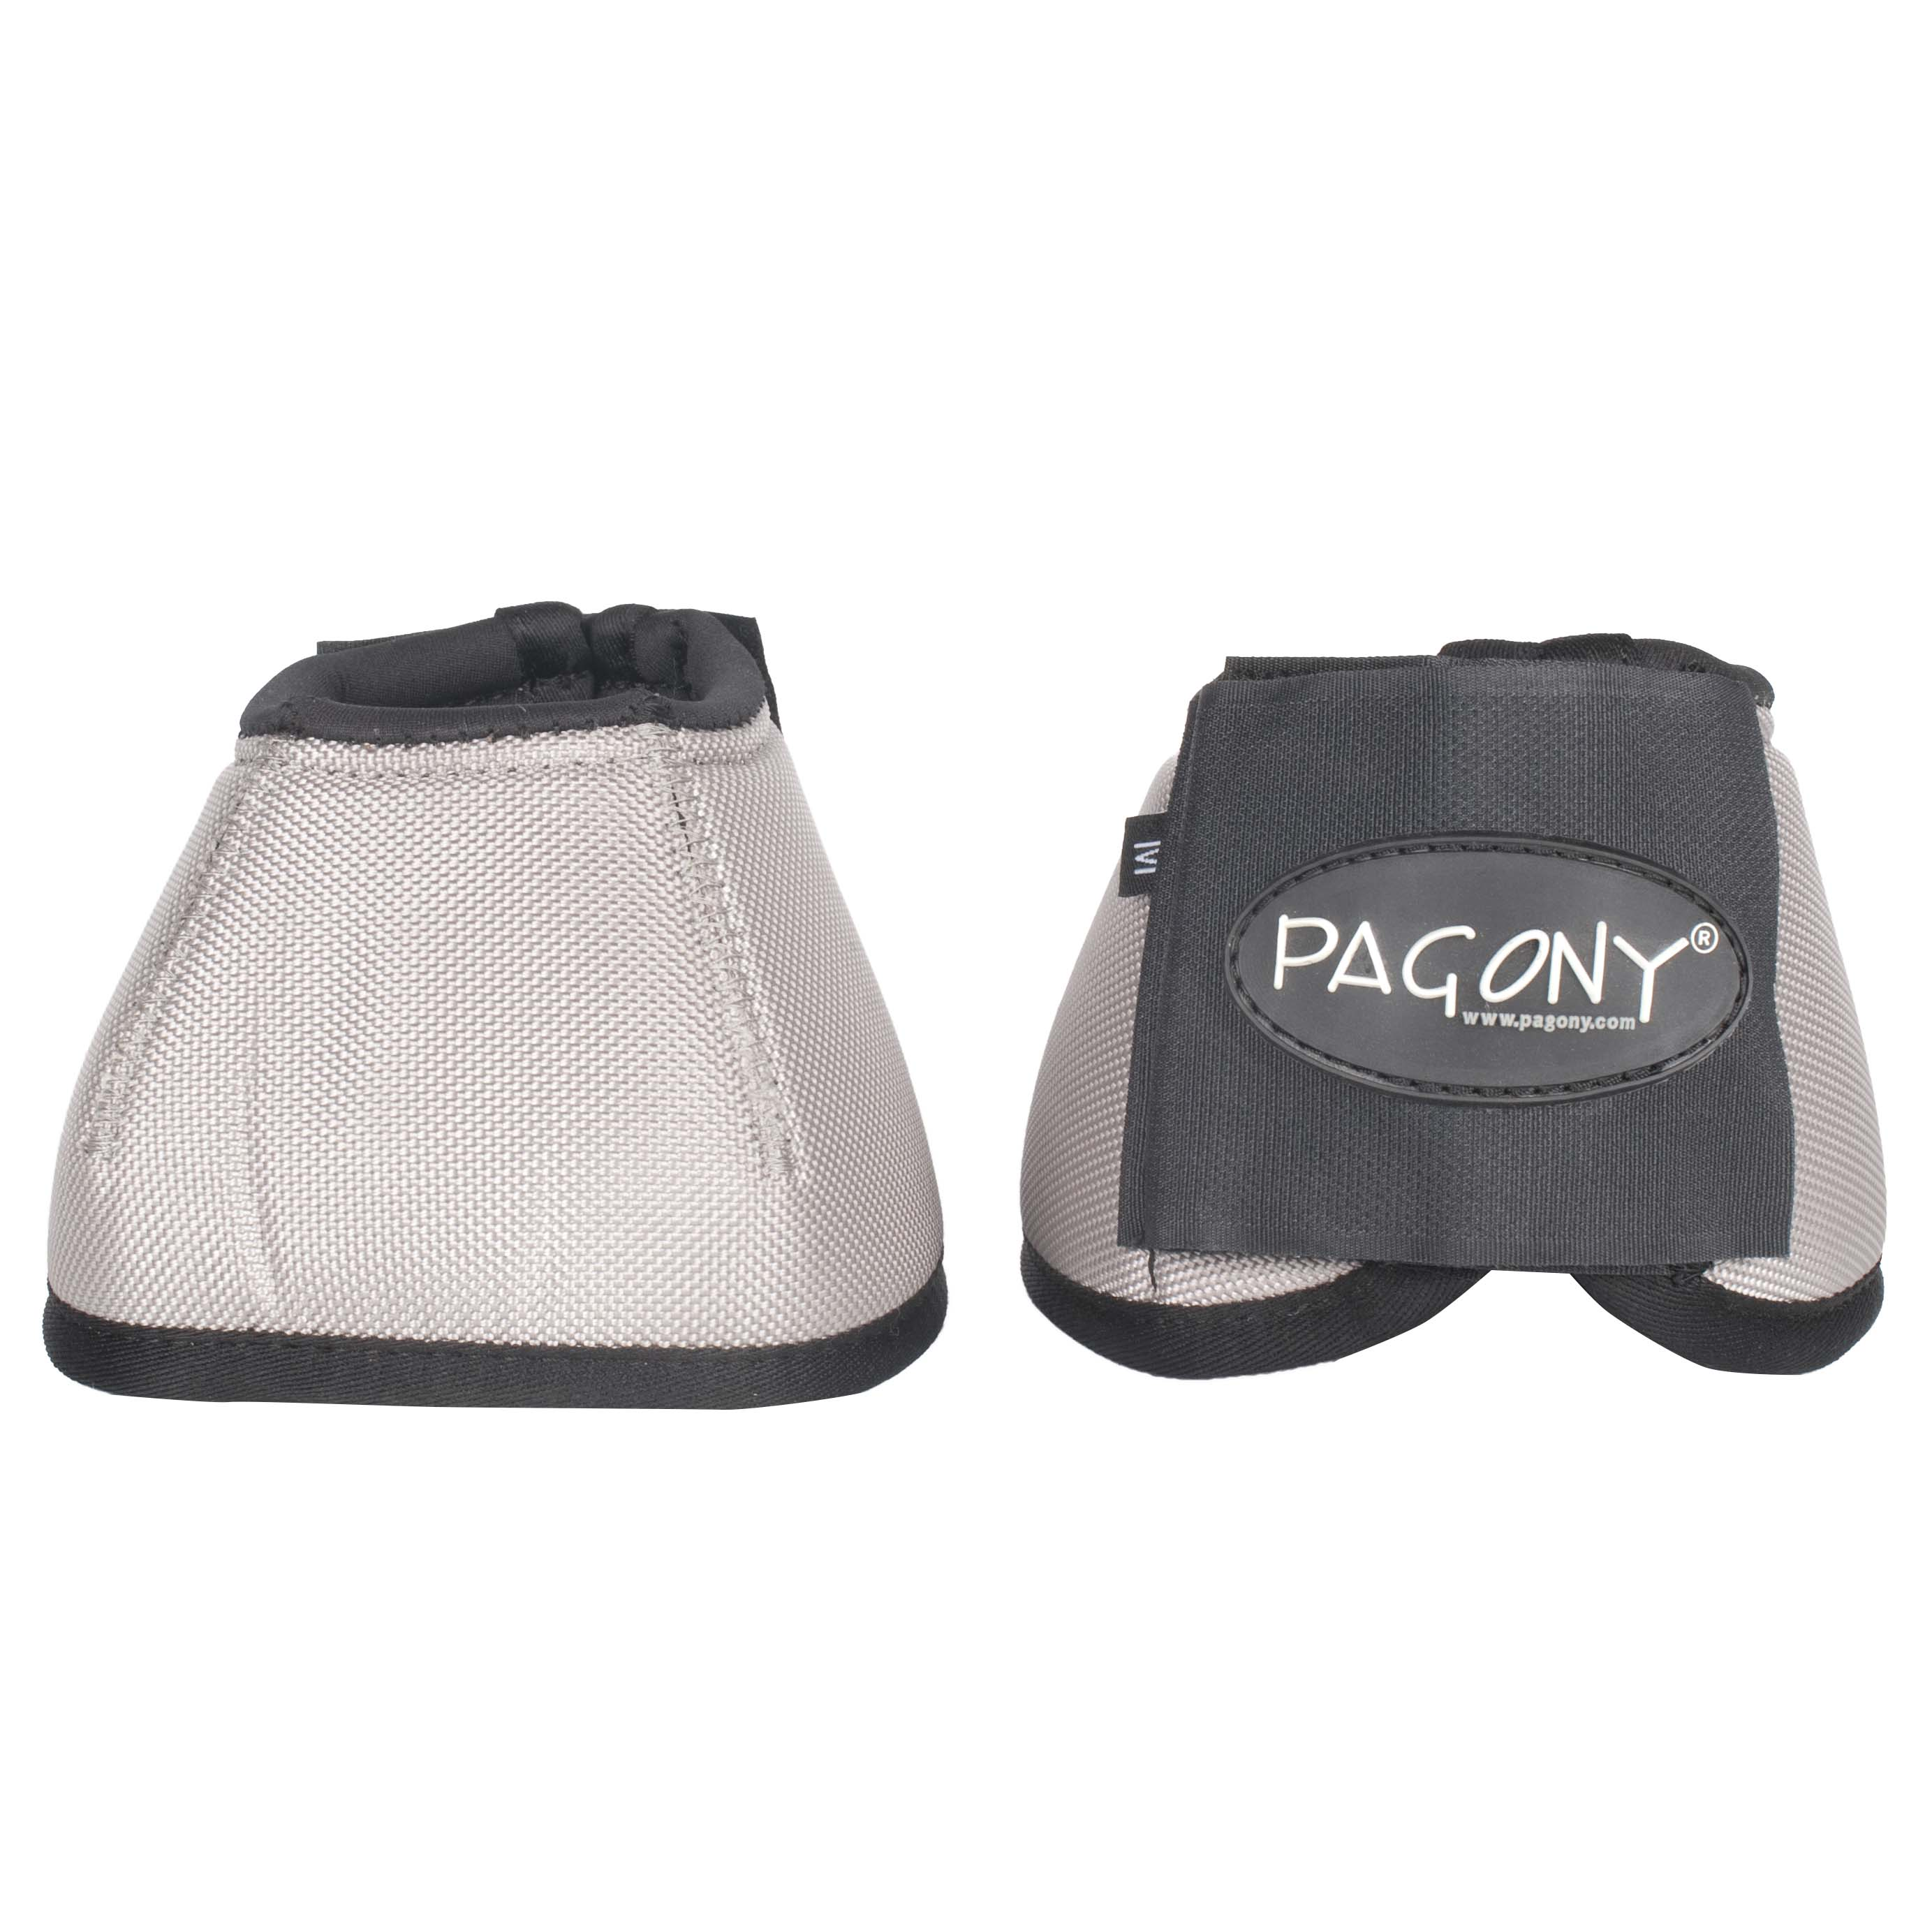 Pagony Champion springschoenen donkergrijs maat:m